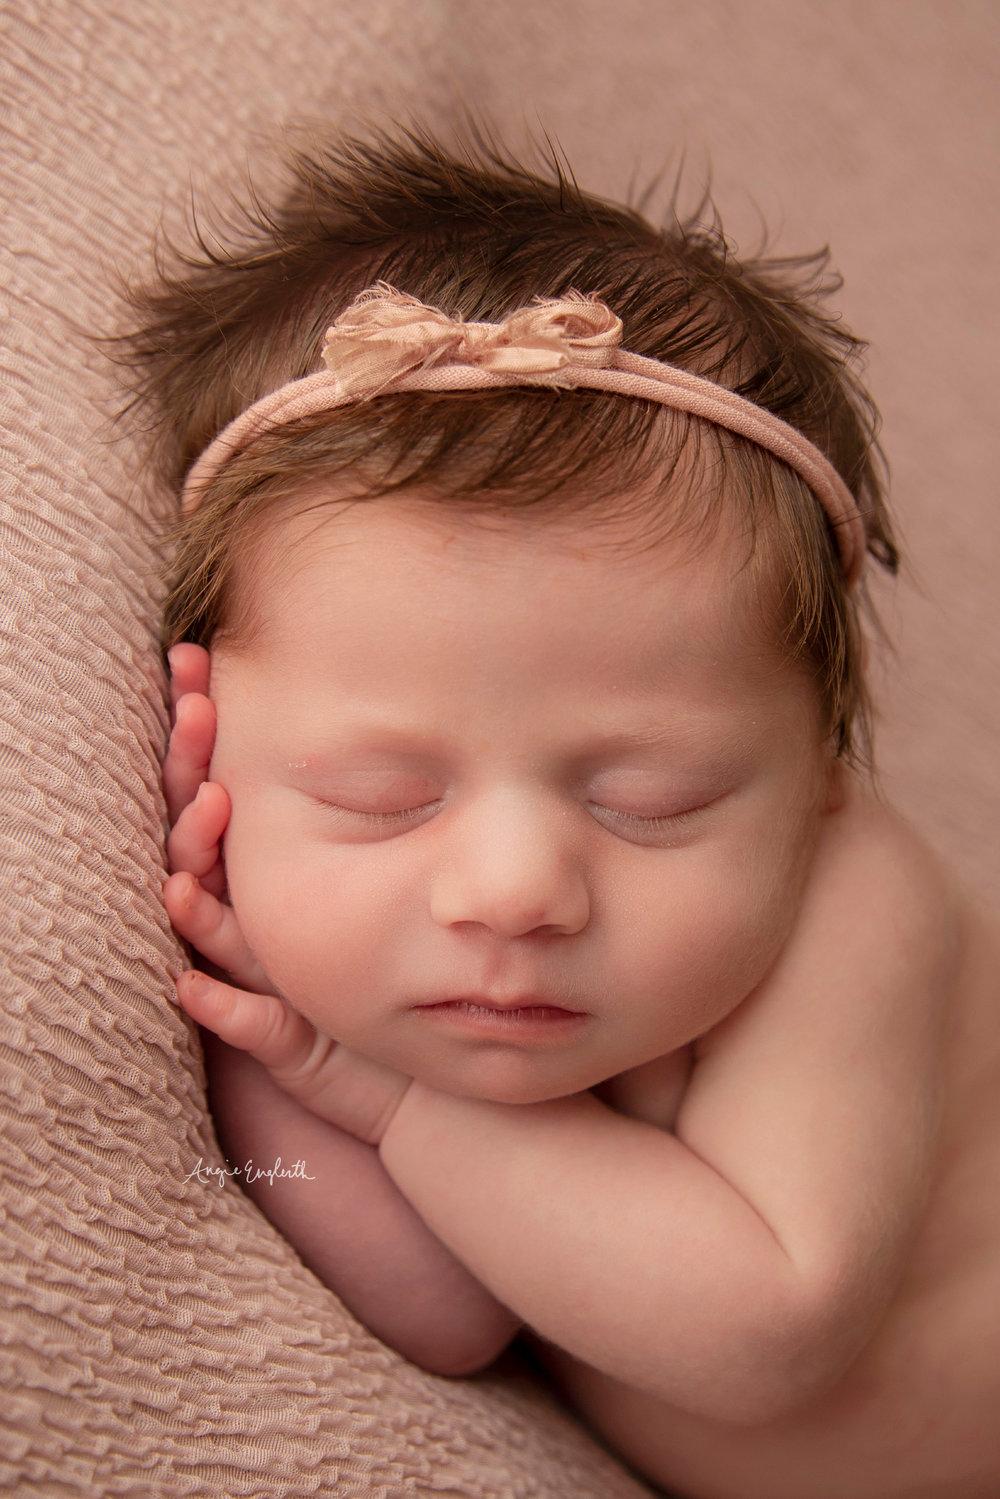 Lancaster_Newborn_Photographer_Angie_Englerth_Jenna_007.jpg